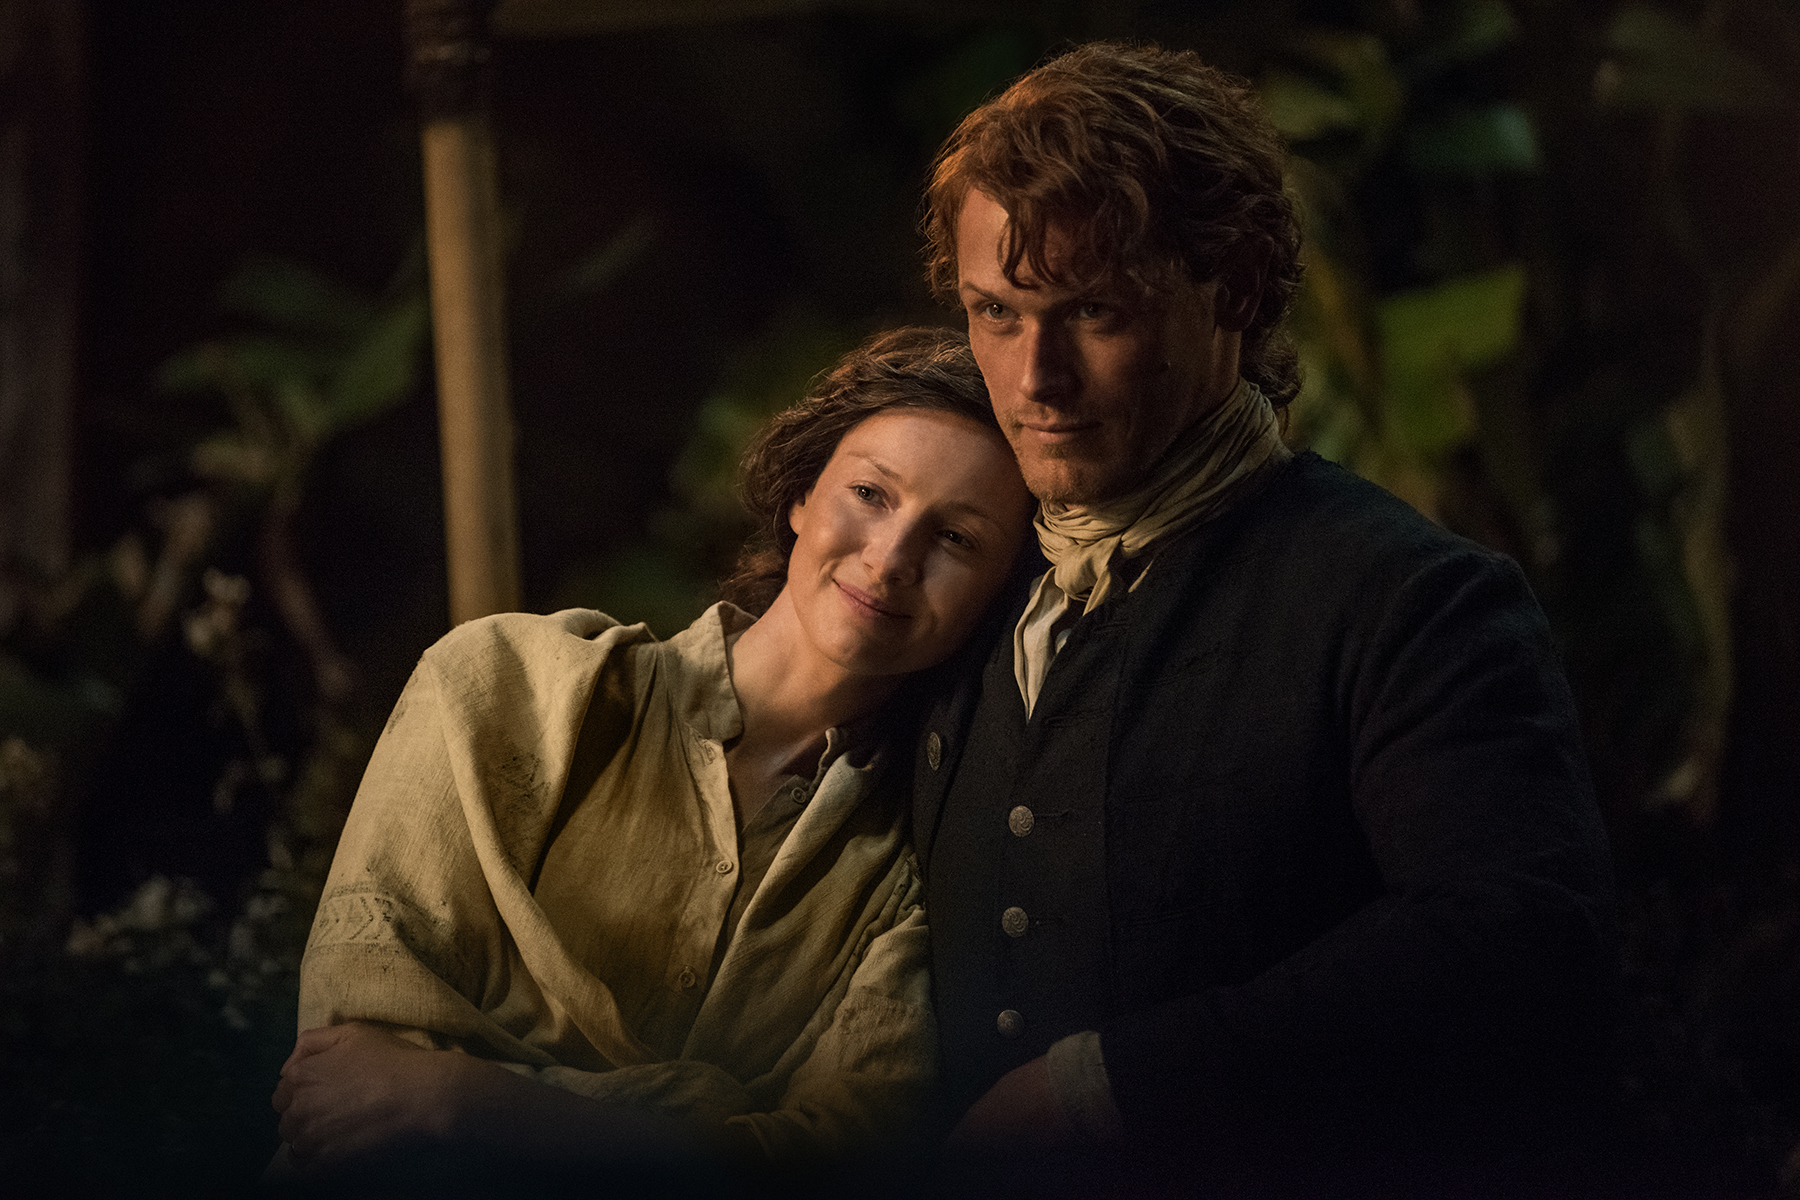 Outlander Season 3 Episode 12: Claire and Jamie Face Ghosts from the Past Outlander Season 3 Episode 12: Claire and Jamie Face Ghosts from the Past new foto